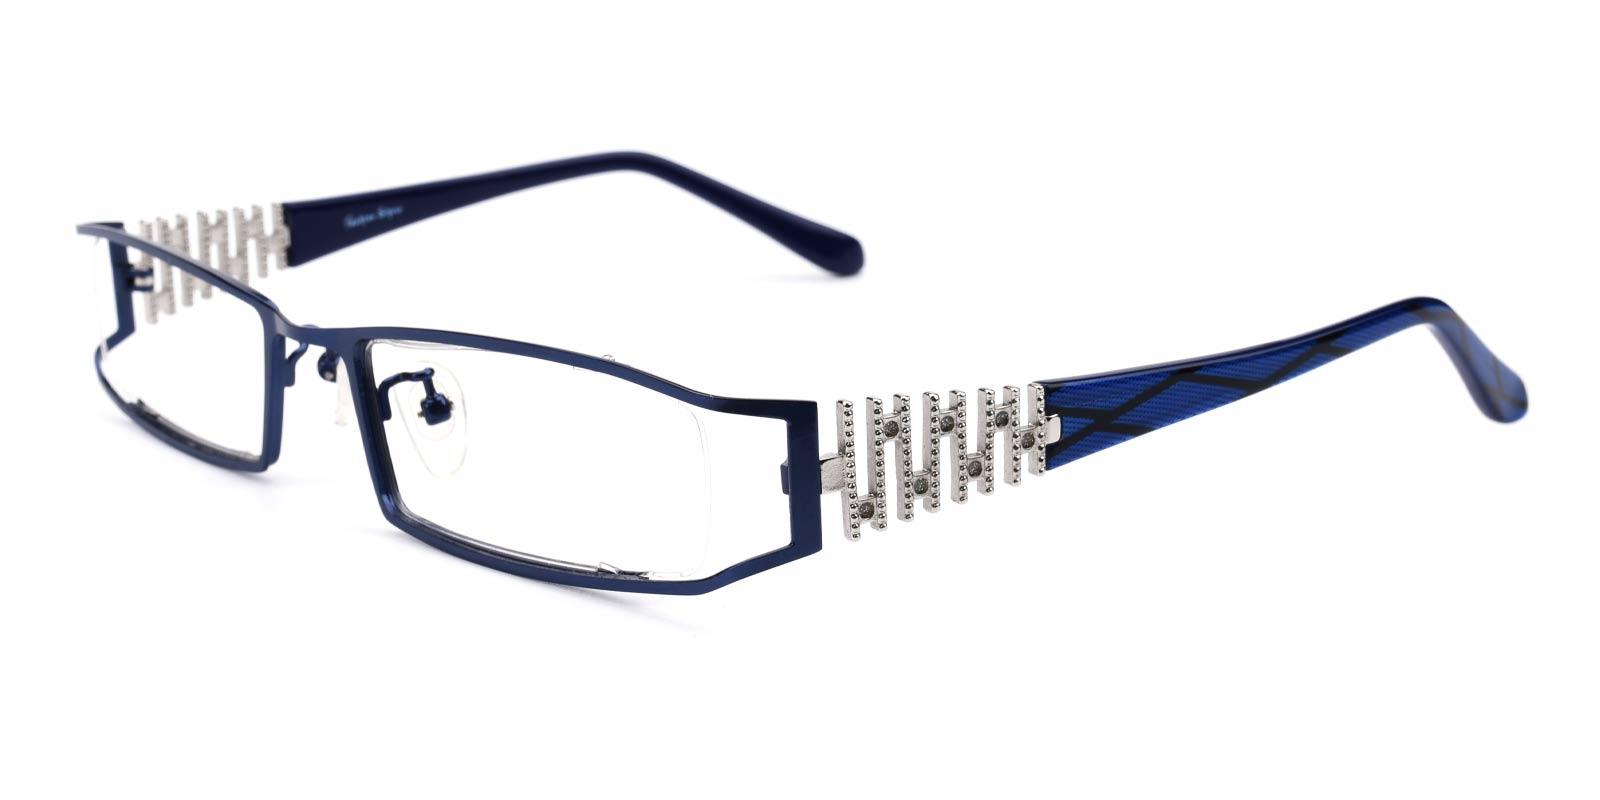 Akili-Blue-Rectangle-Metal-Eyeglasses-additional1